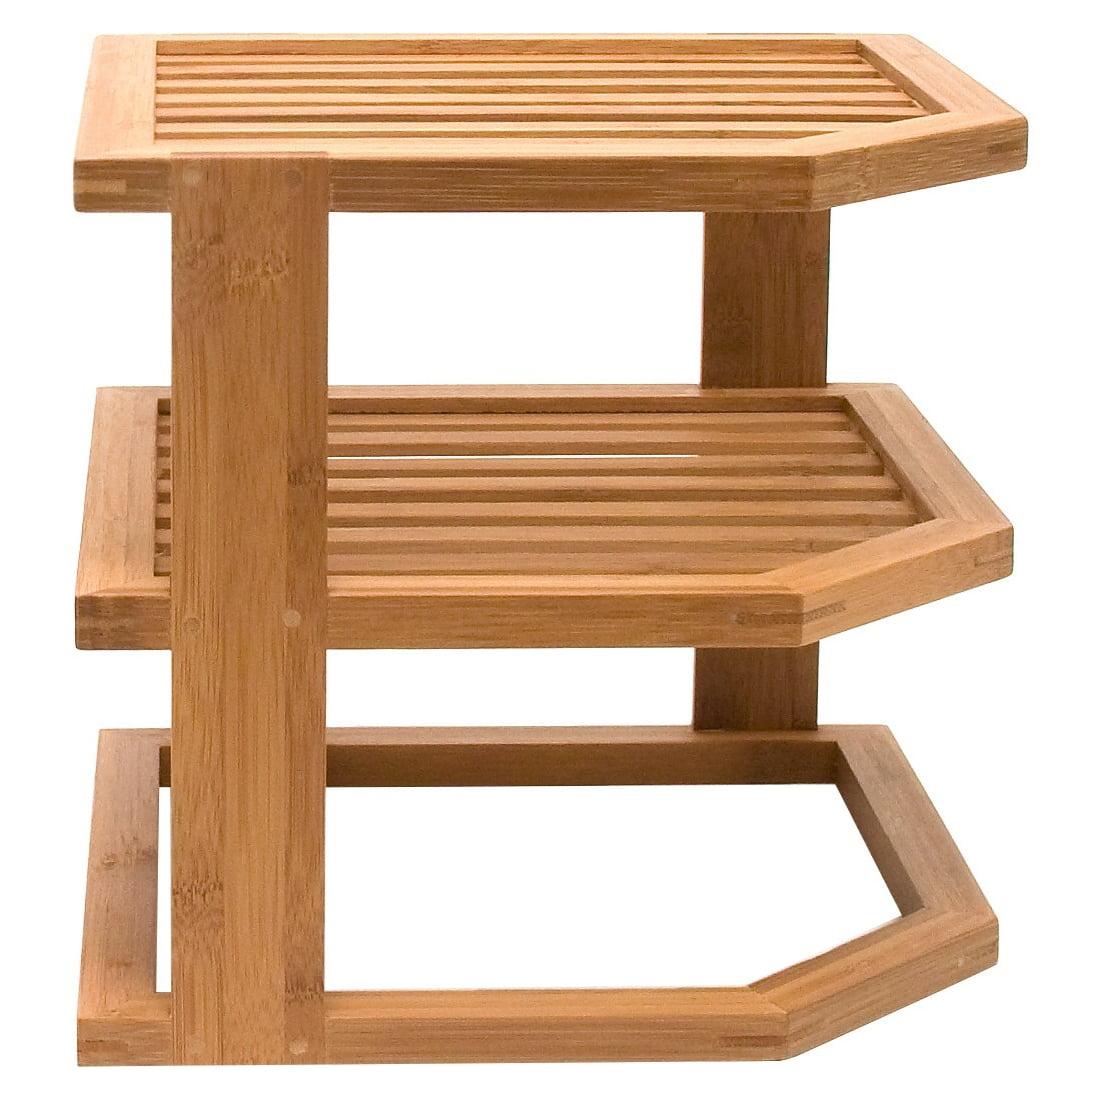 "Lipper Bamboo Three-tier Corner Shelf - Cabinet - 9.5"" Height X 10"" Width X 10"" Depth - 3 Tier[s] - Bamboo - Brown (8883_2_1)"